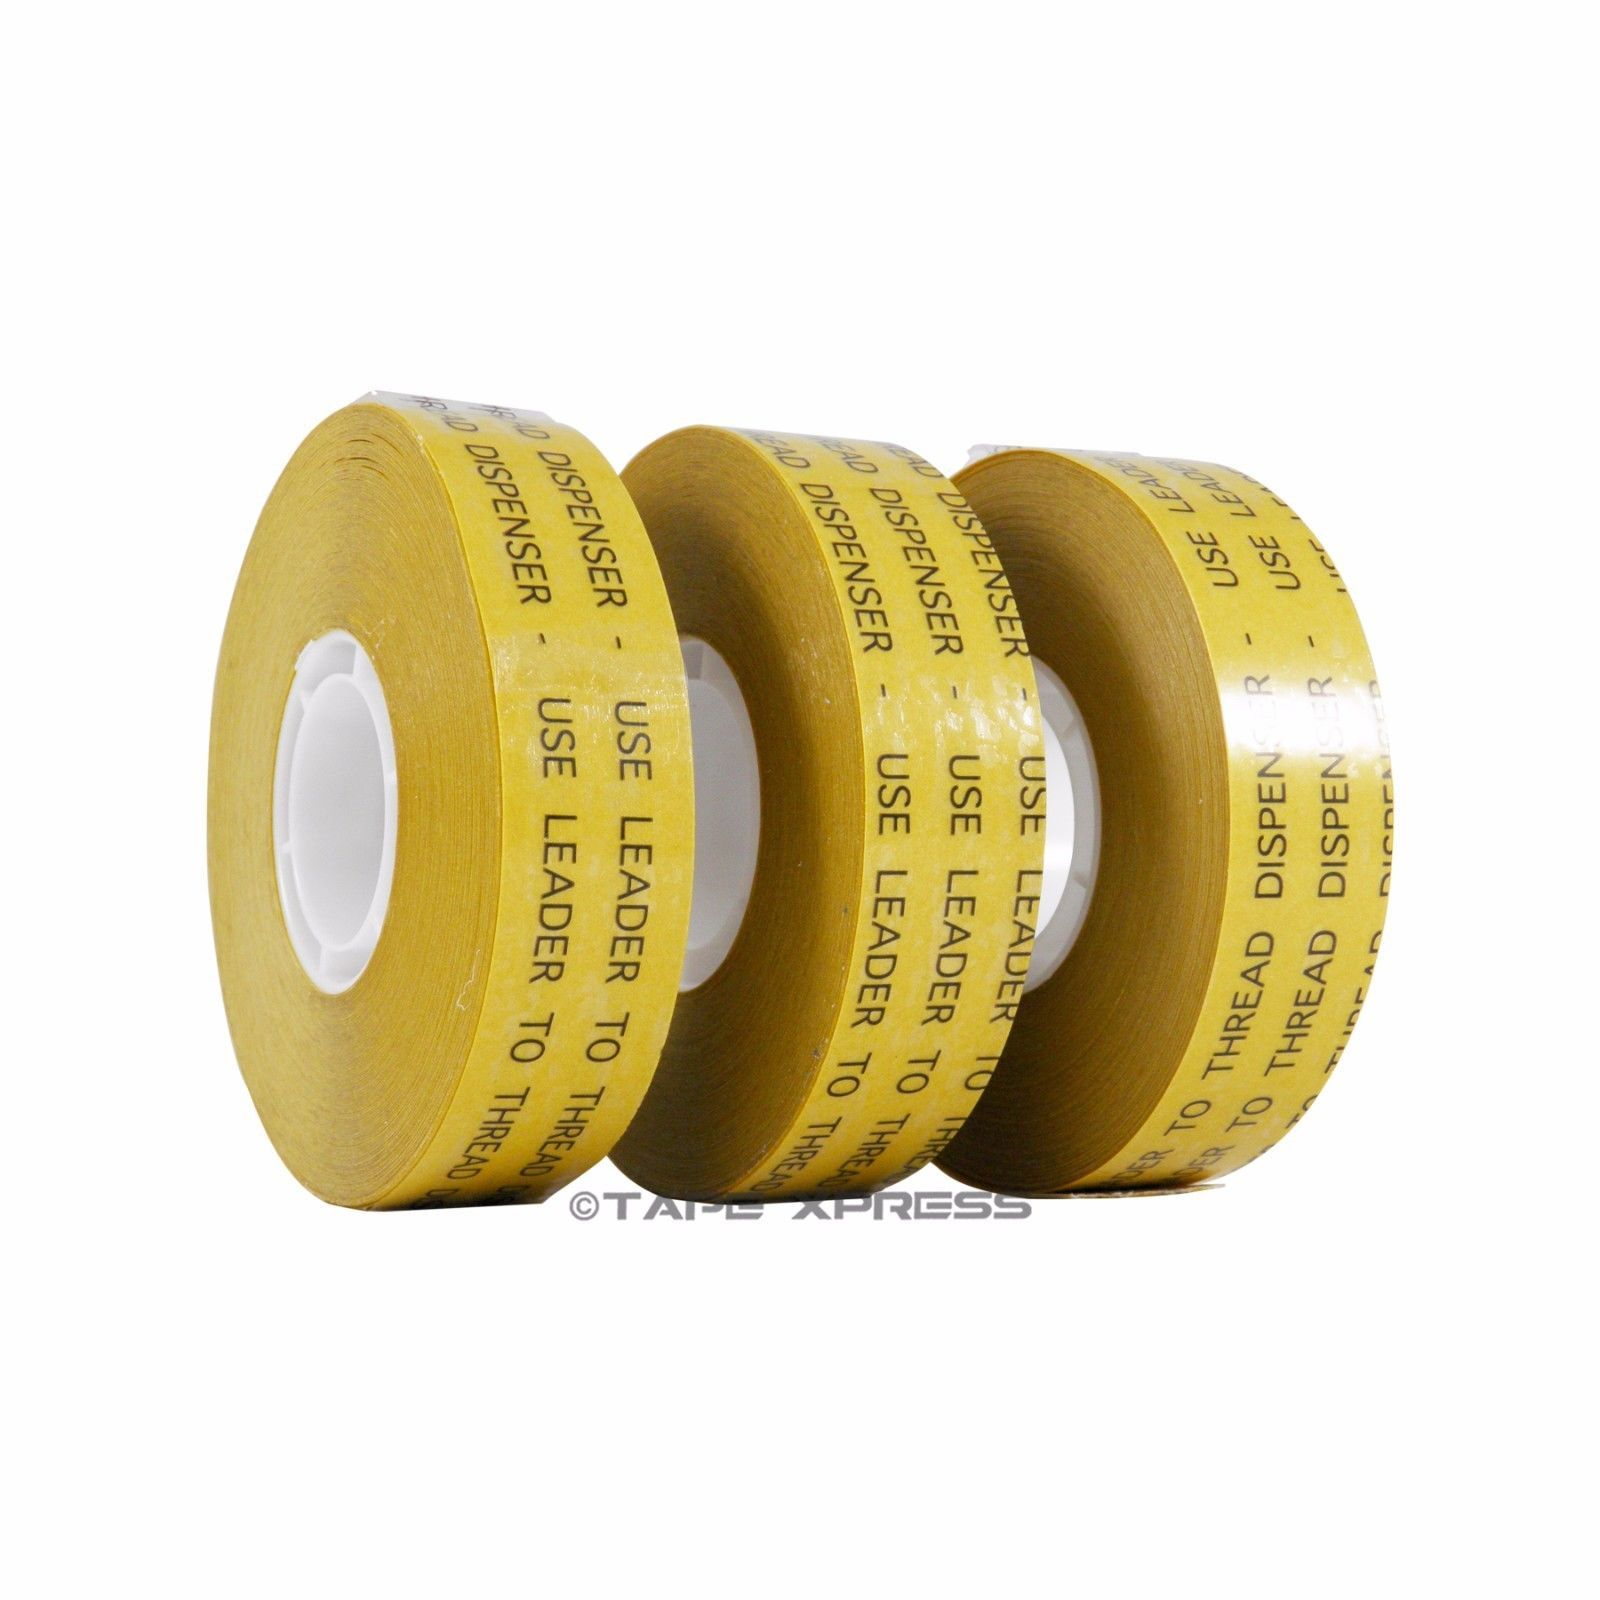 "Photo Crafts Scrapbooking 72 rolls 1//2/"" ATG Adhesive Transfer Tape Fits 3M Gun"